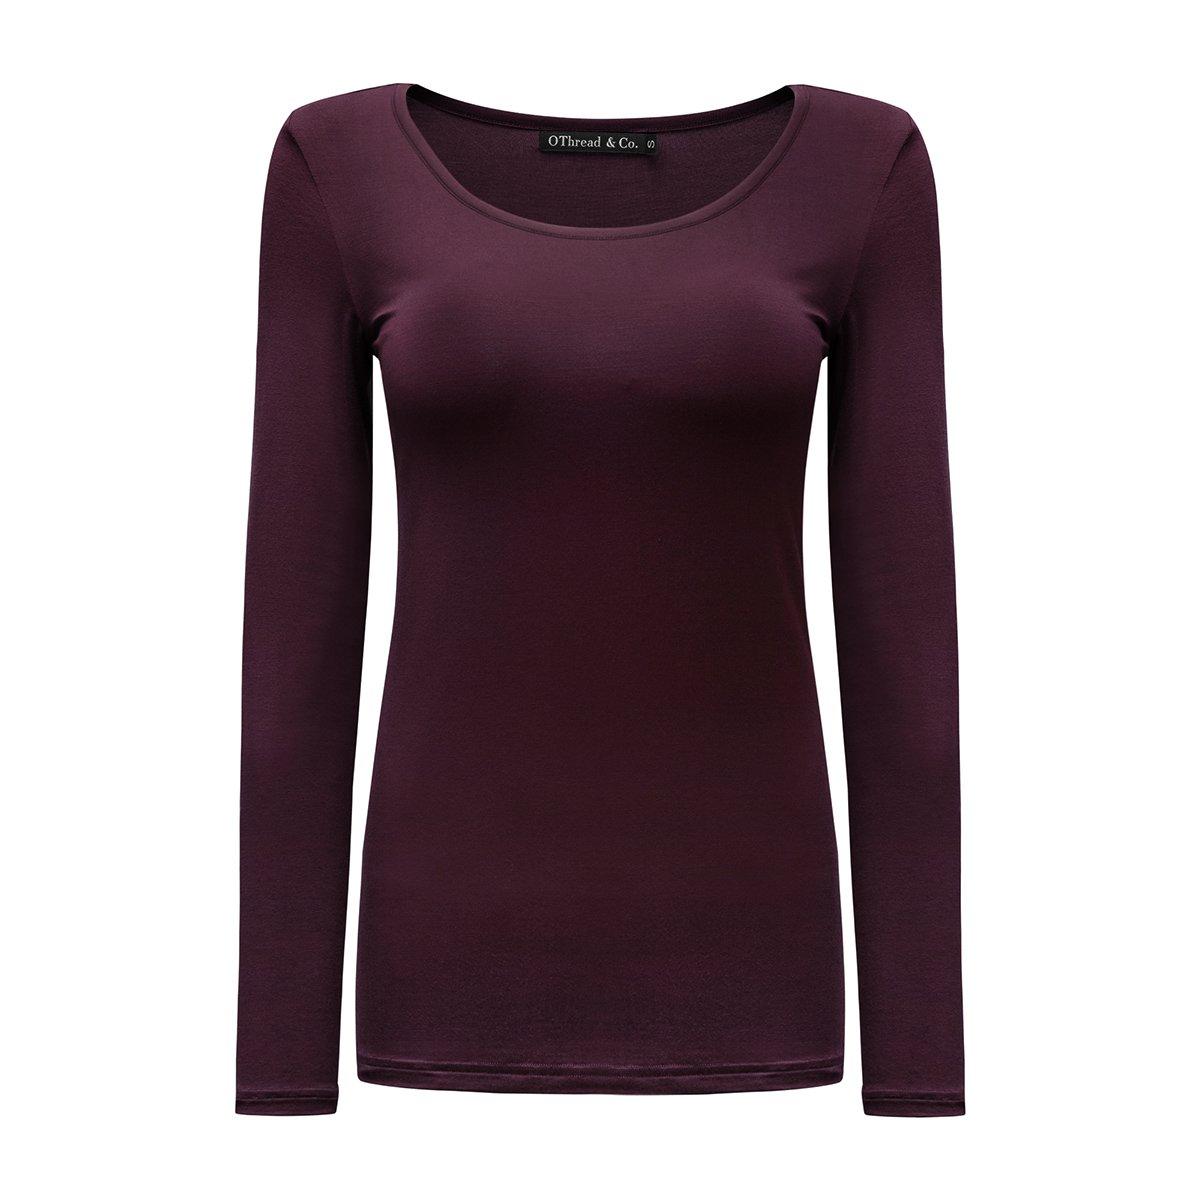 OThread & Co. Women's Long Sleeve T-Shirt Scoop